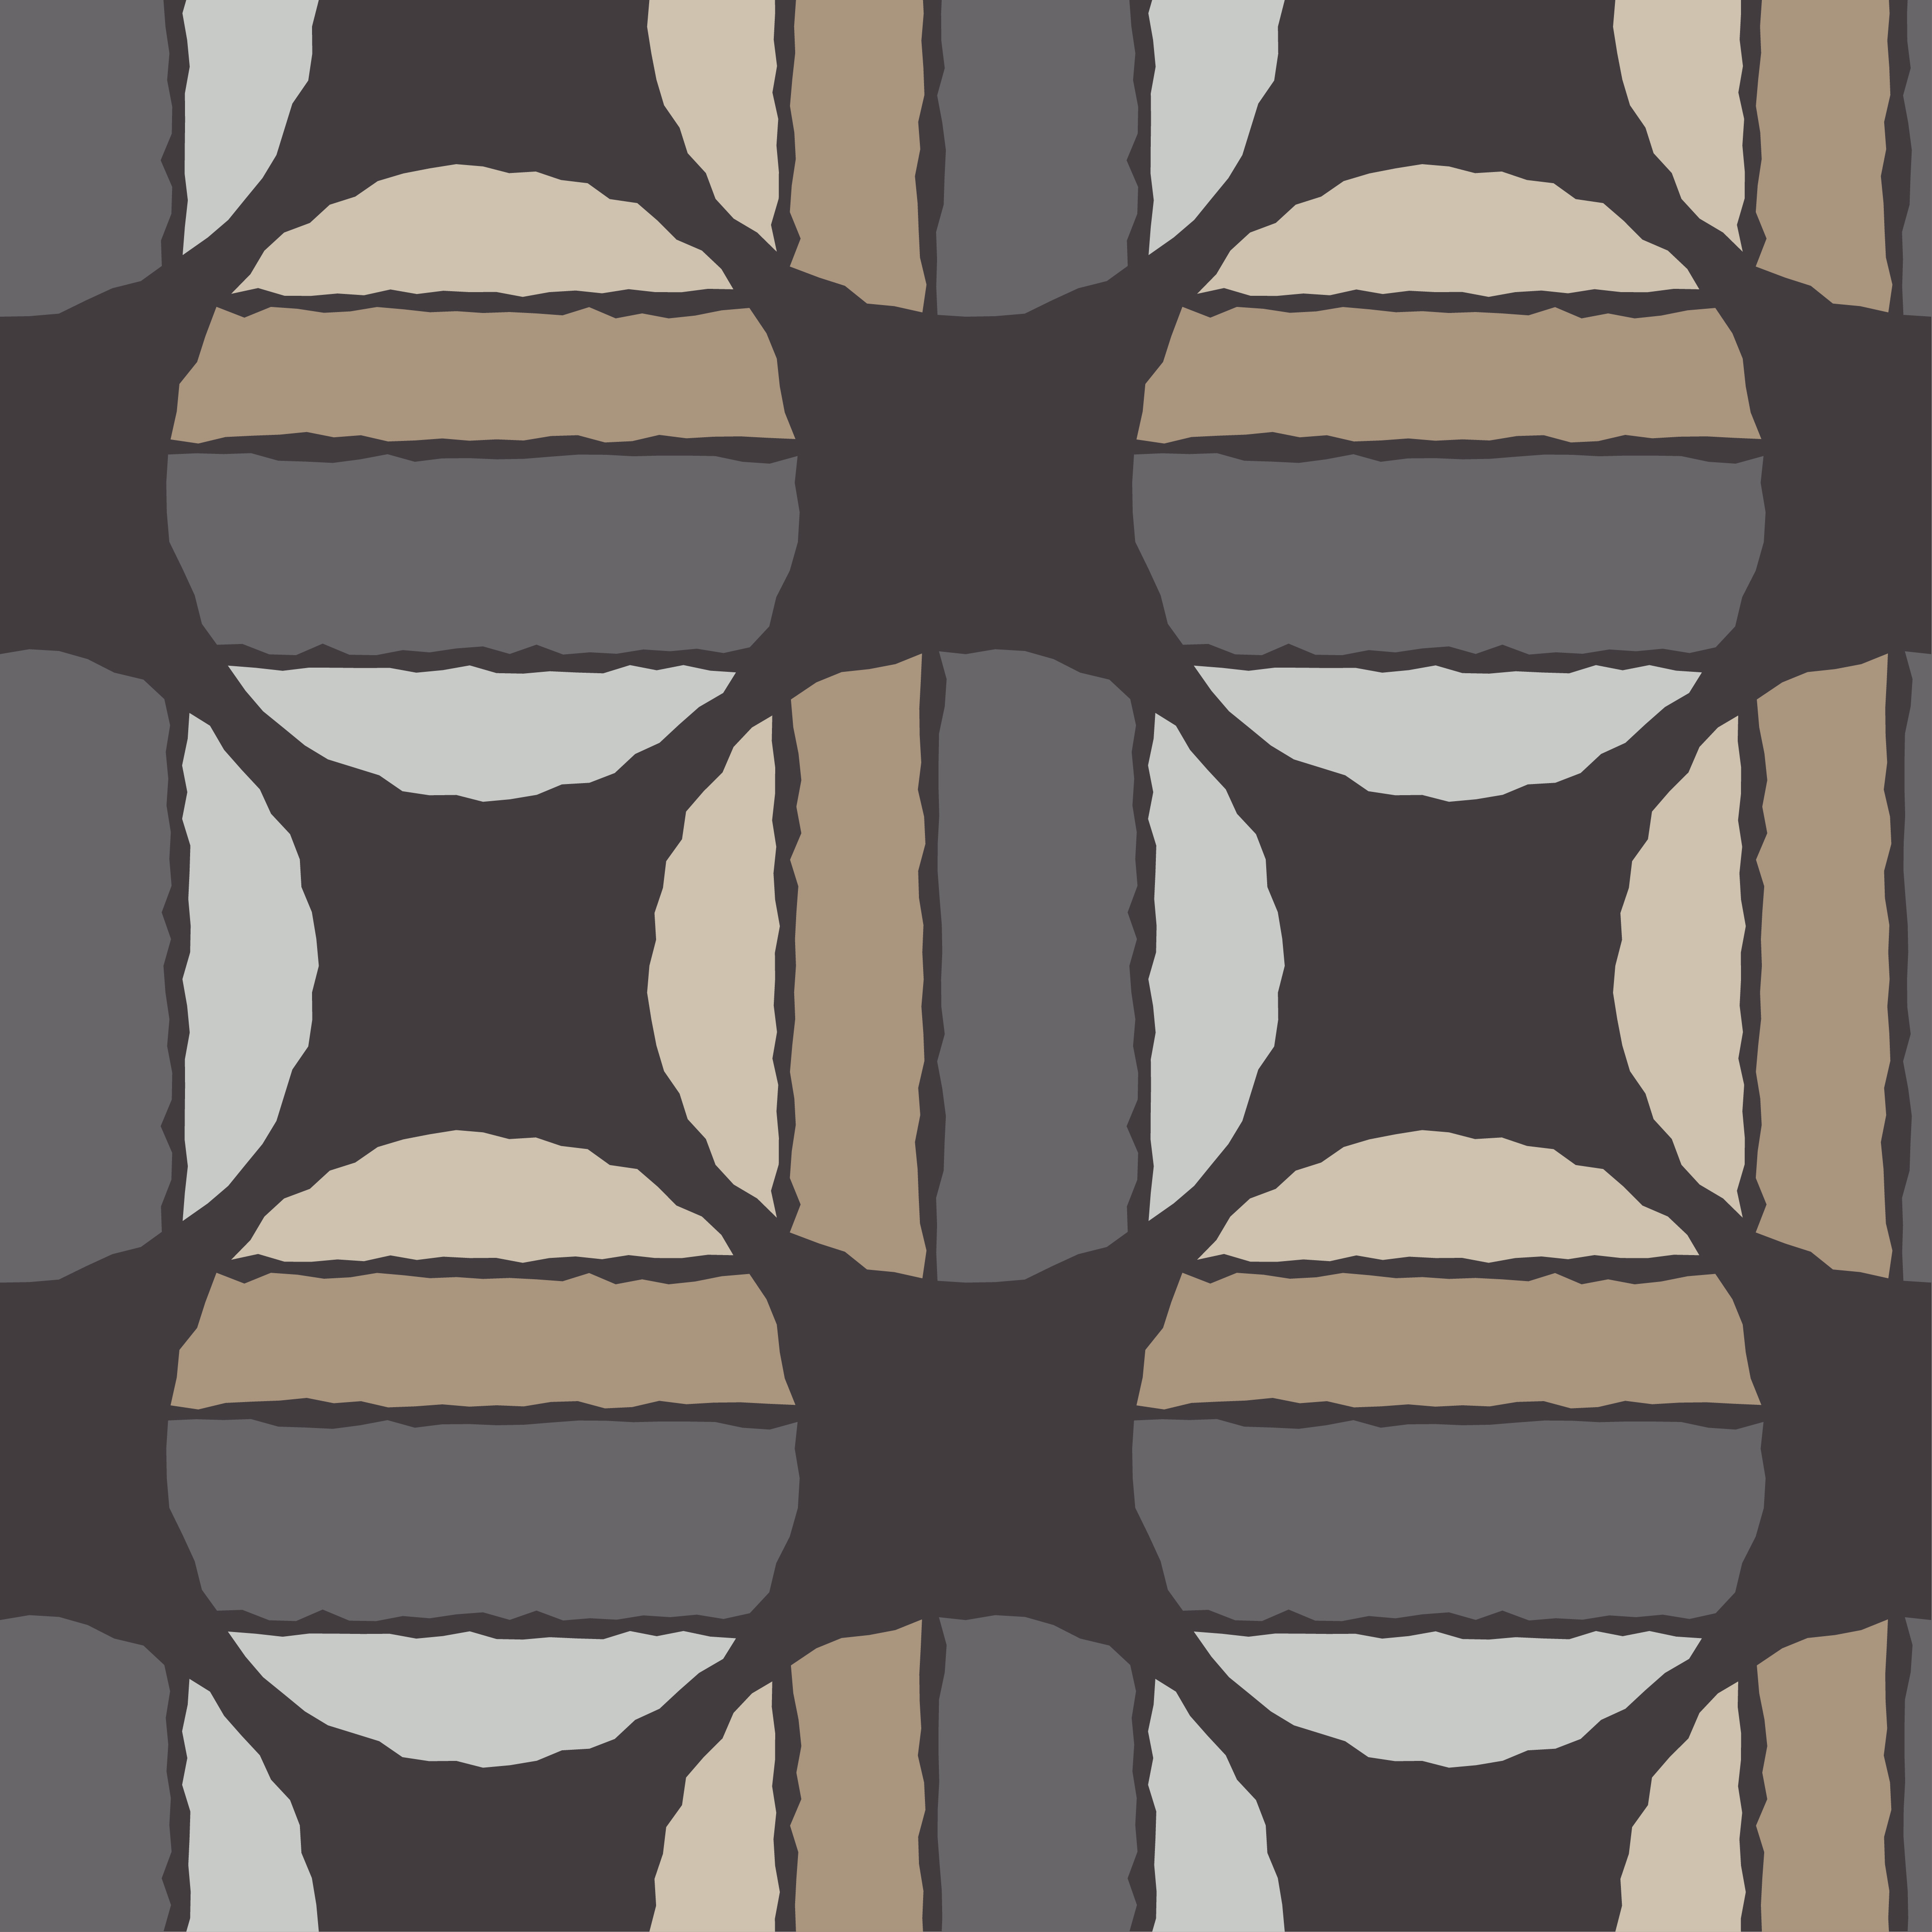 Polka dot seamless pattern. Sketch texture.  example image 2